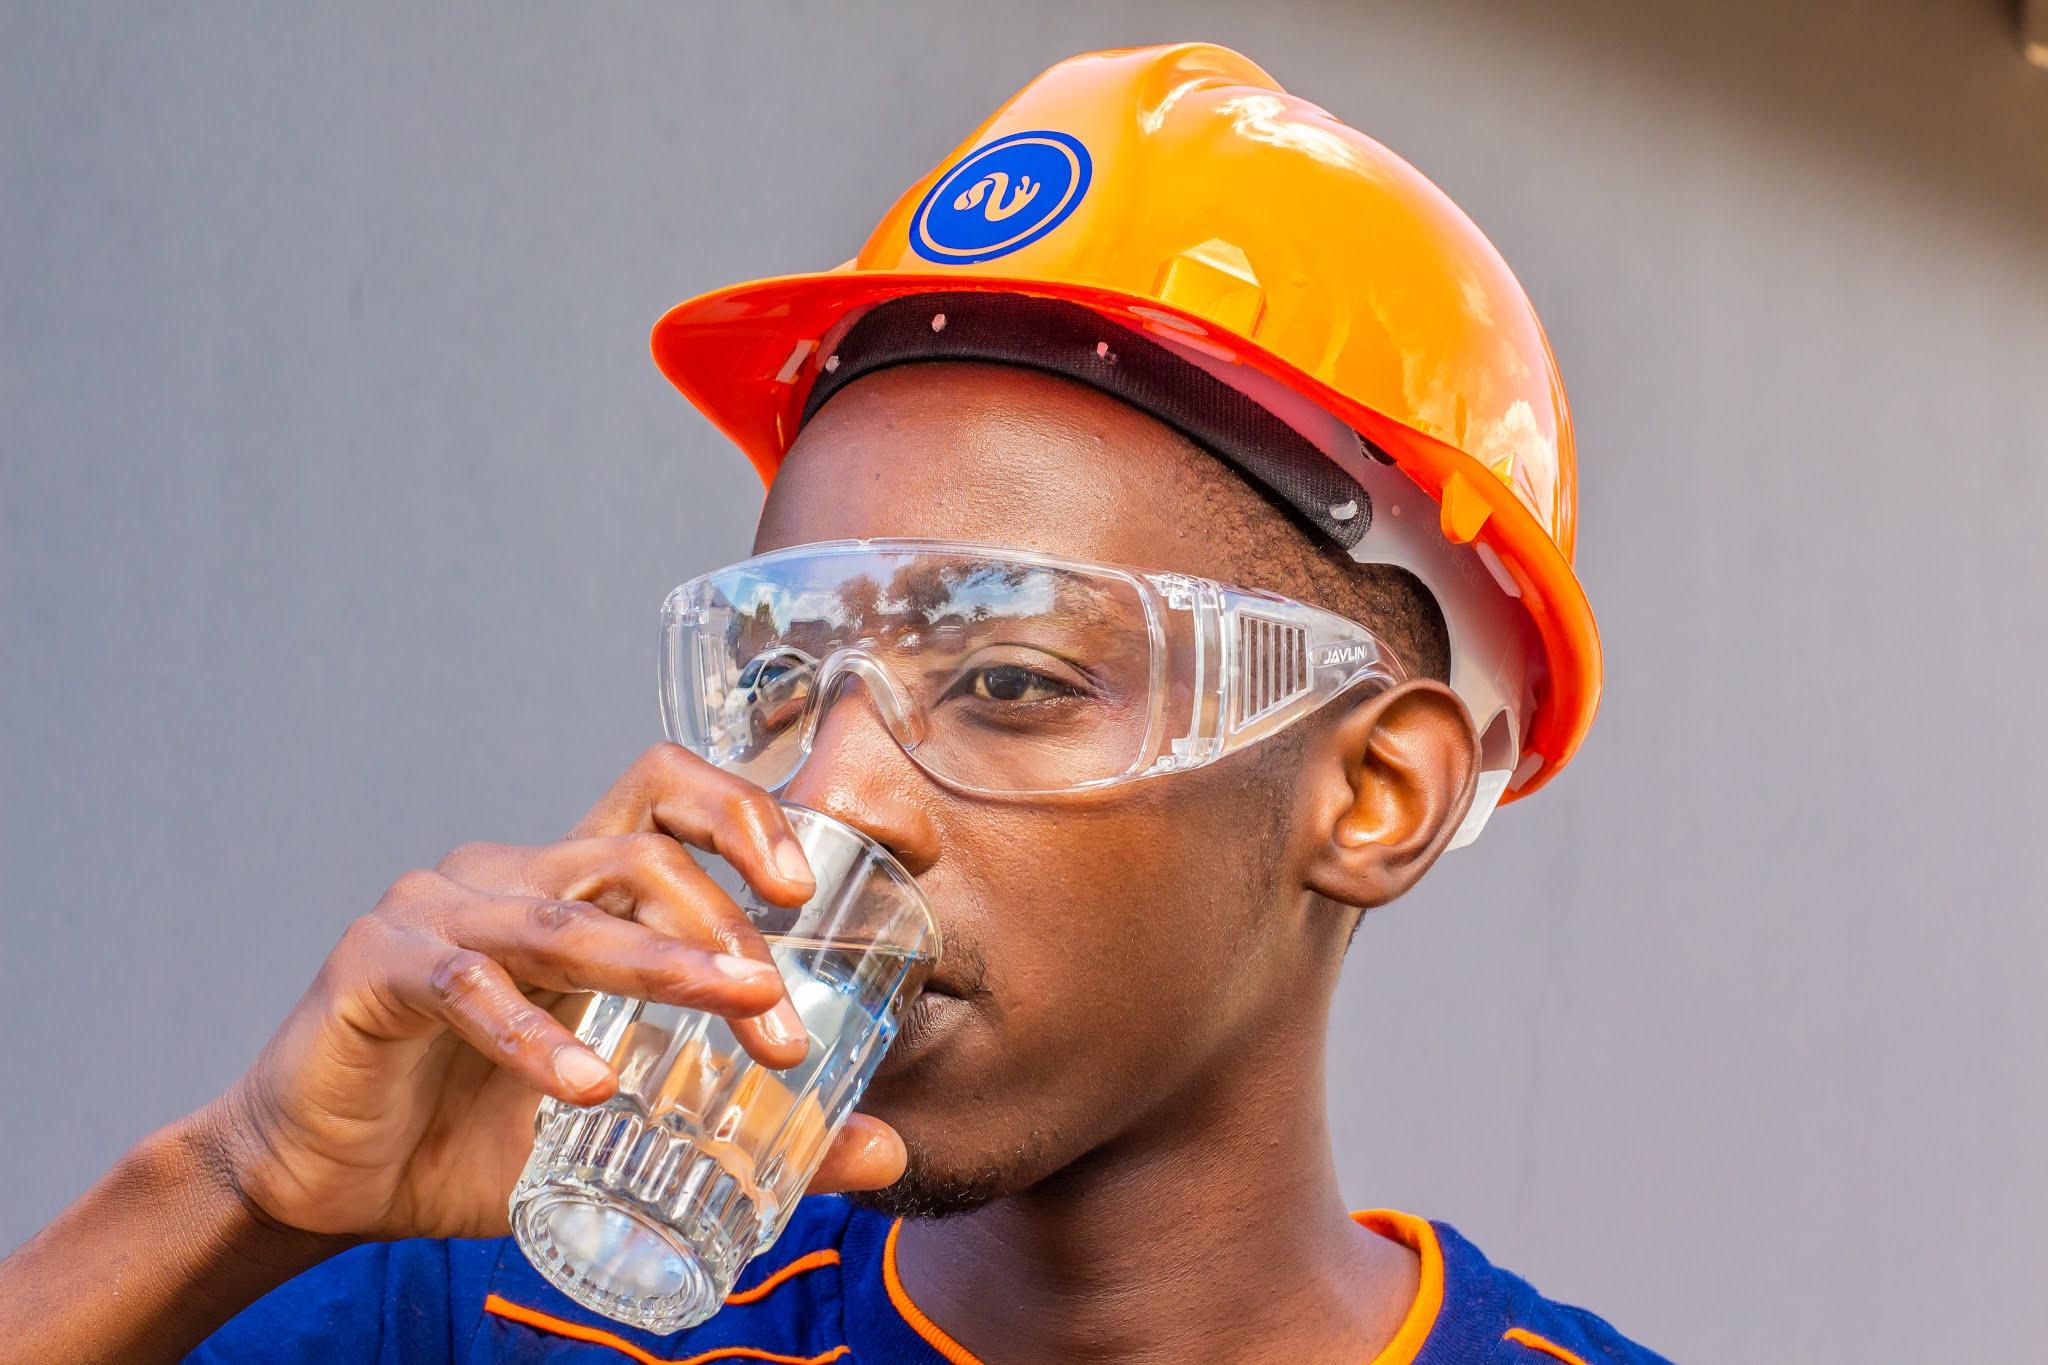 Nakiso Borehole Drilling - The Top Borehole Drilling and Installation Company In Zimbabwe